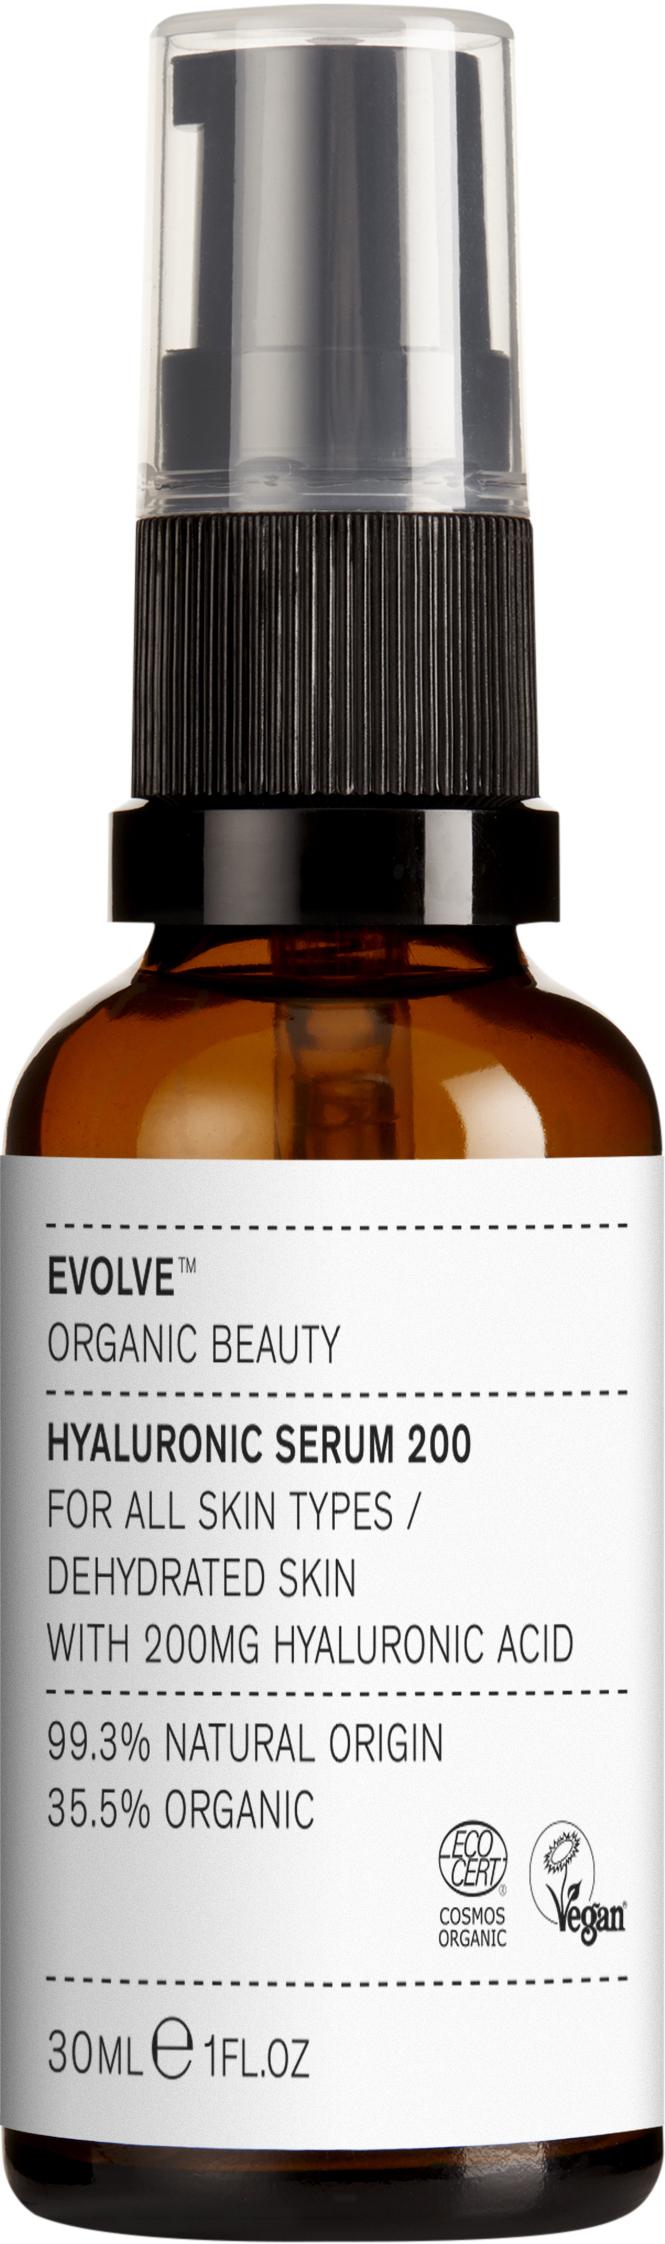 Evolve Hyaluronic Serum 200, 30 ml